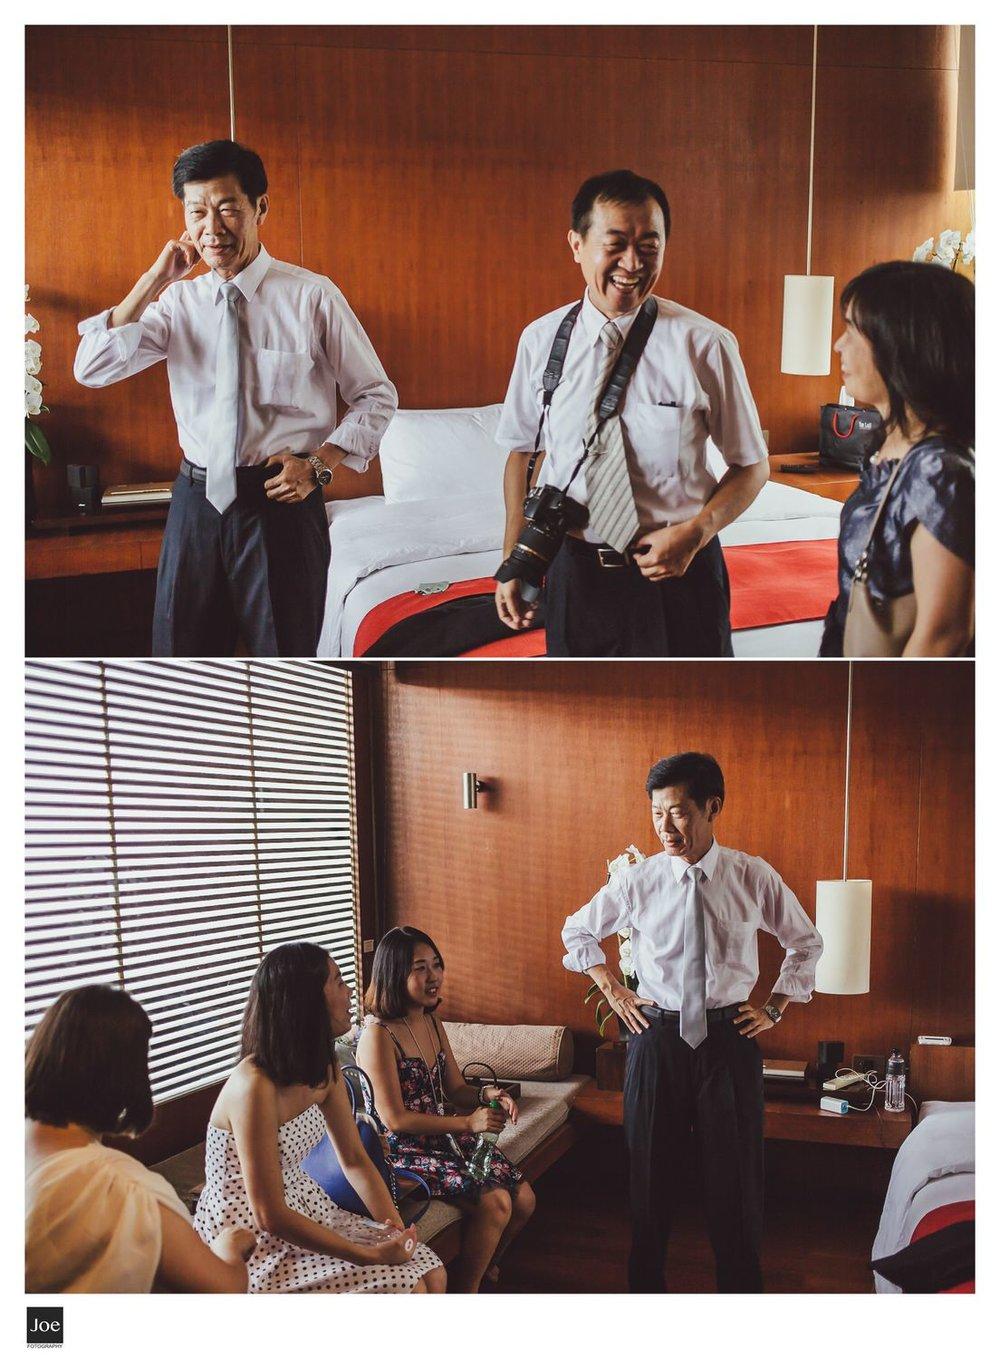 joe-fotography-the-lalu-sun-moon-lake-wedding-kay-geoffrey-088.jpg